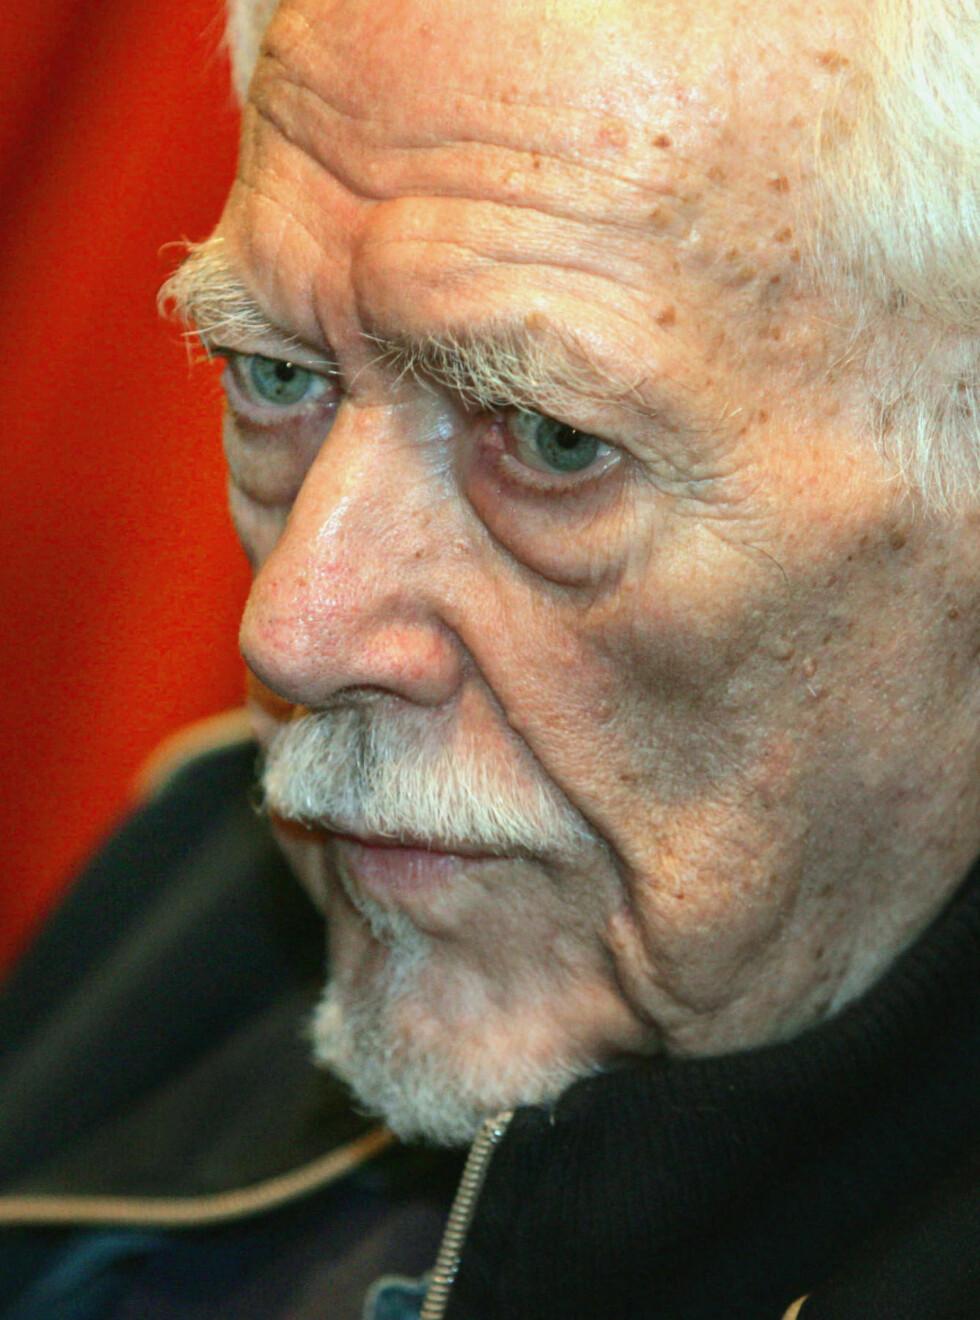 DØD: Det var mandag at Altman gikk bort. Foto: AP/Scanpix